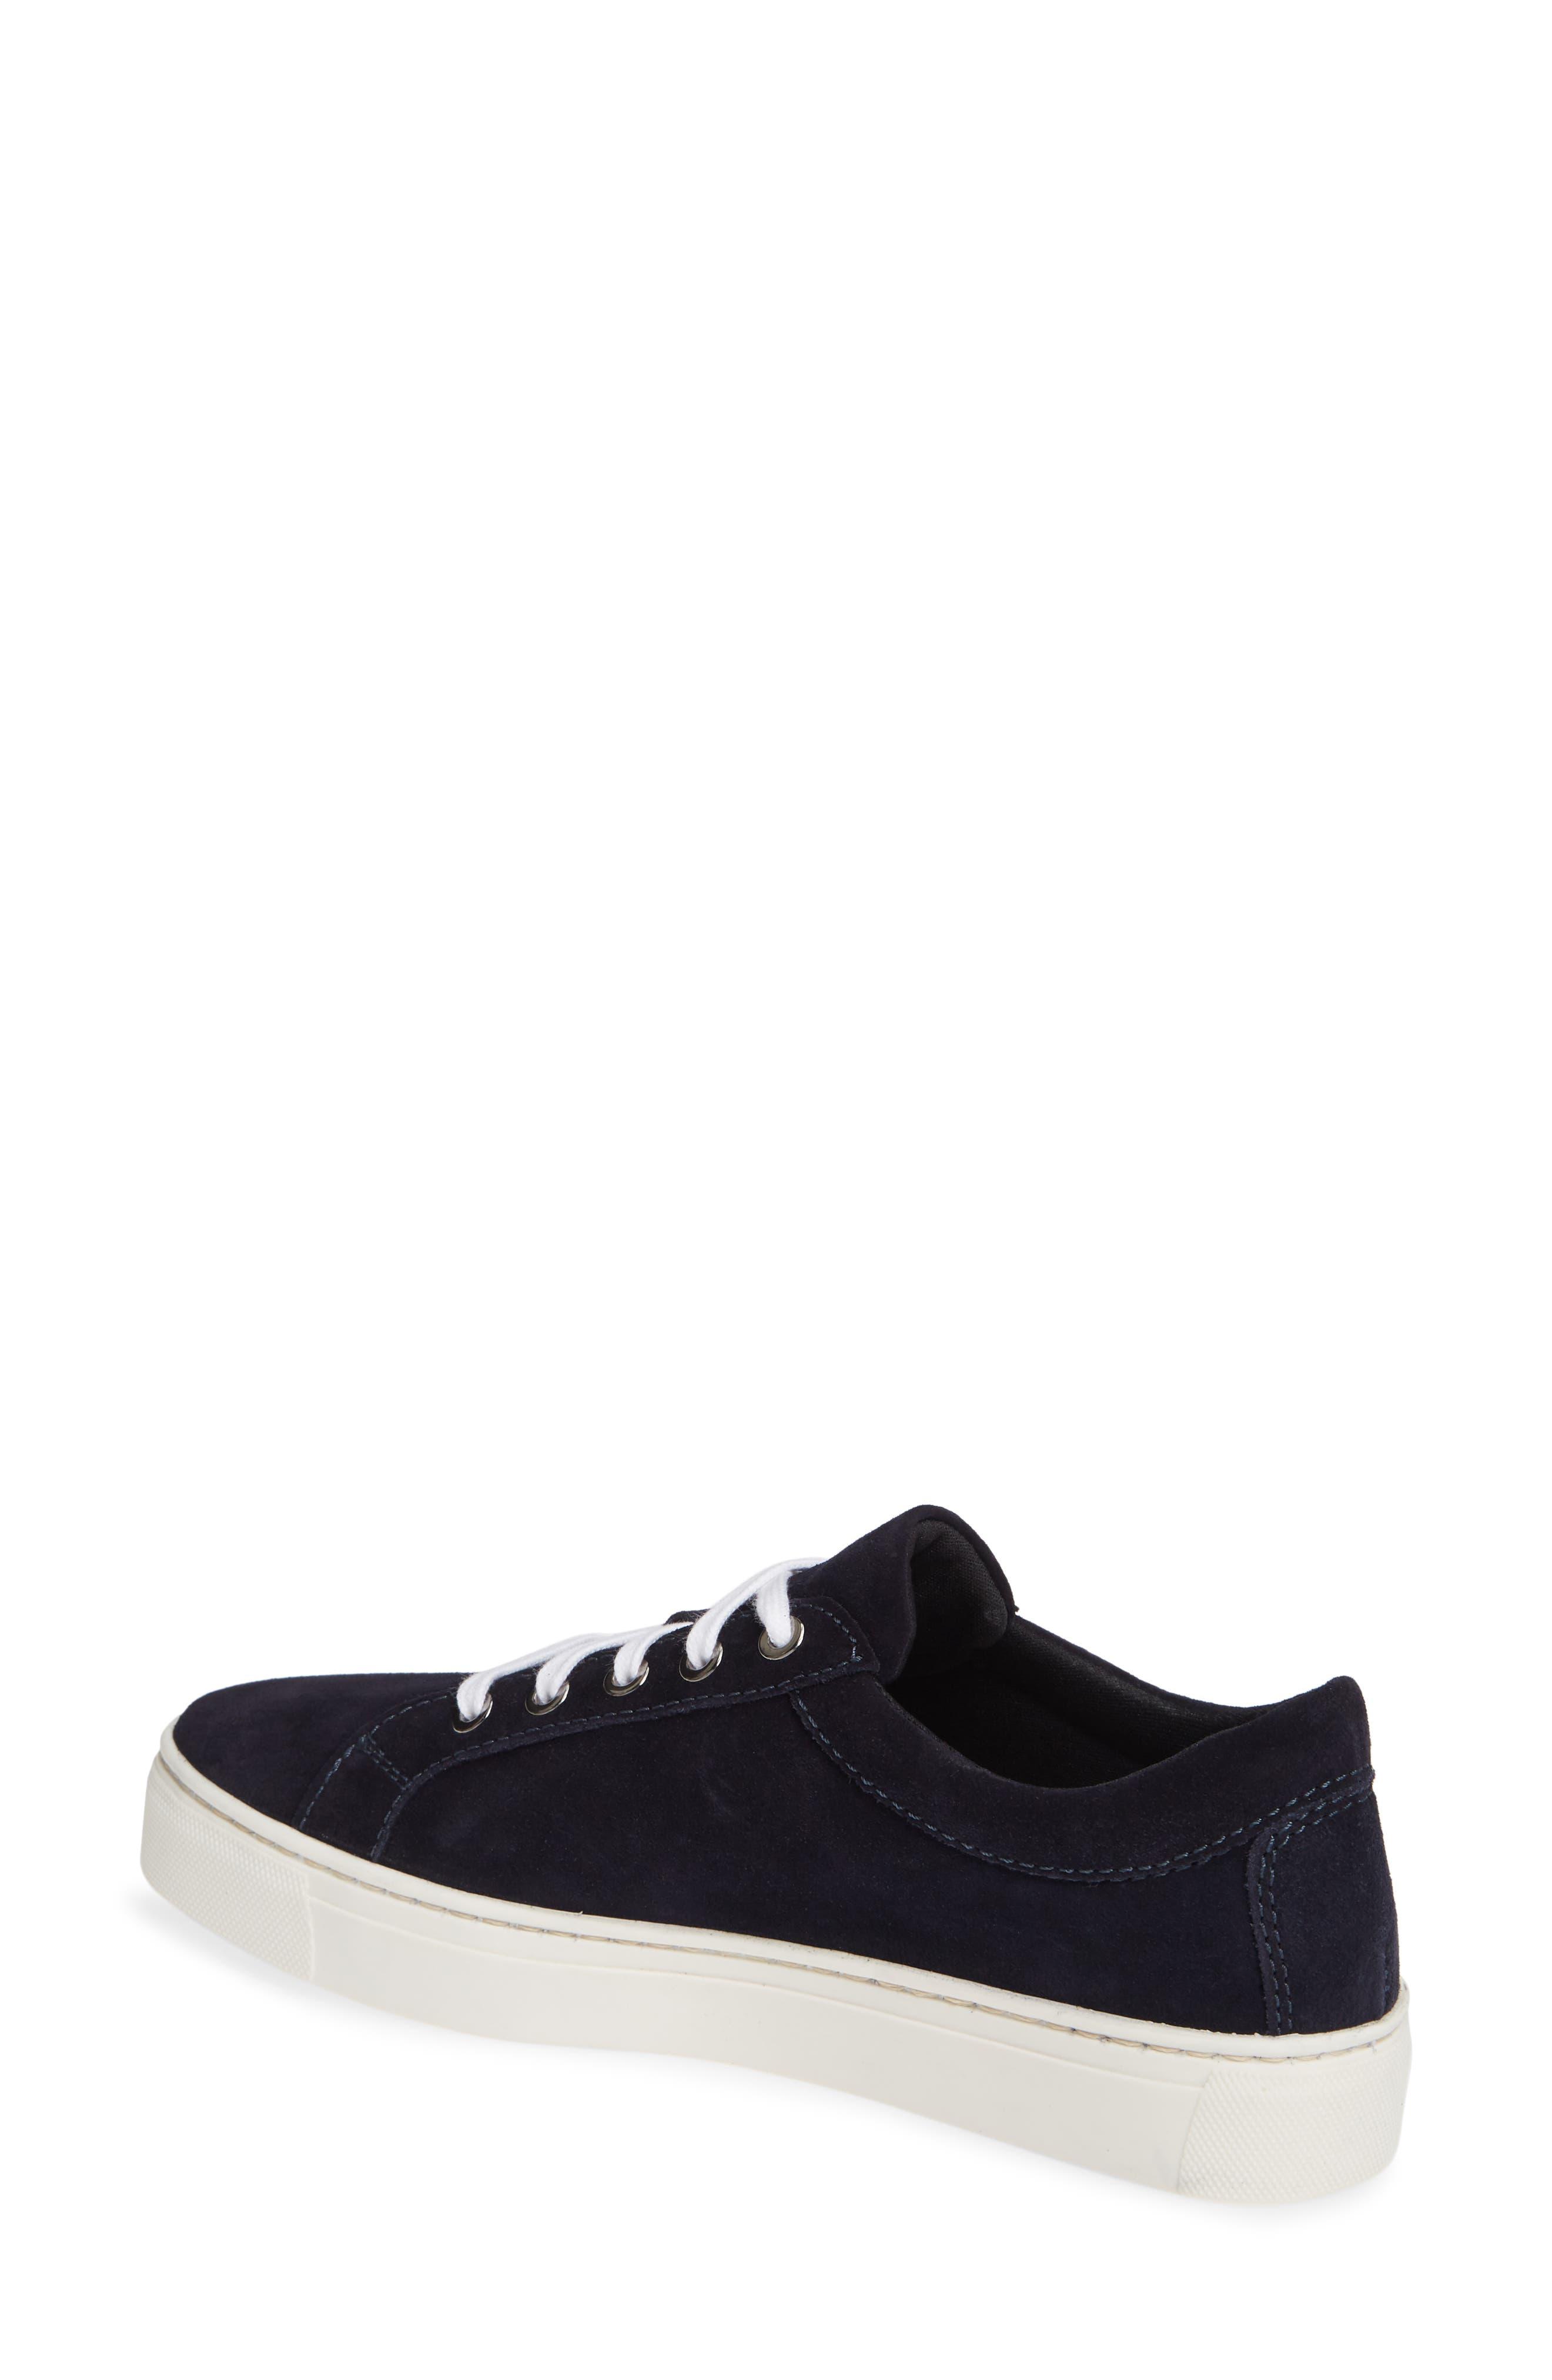 Sneak Away Sneaker,                             Alternate thumbnail 2, color,                             BLUE SUEDE